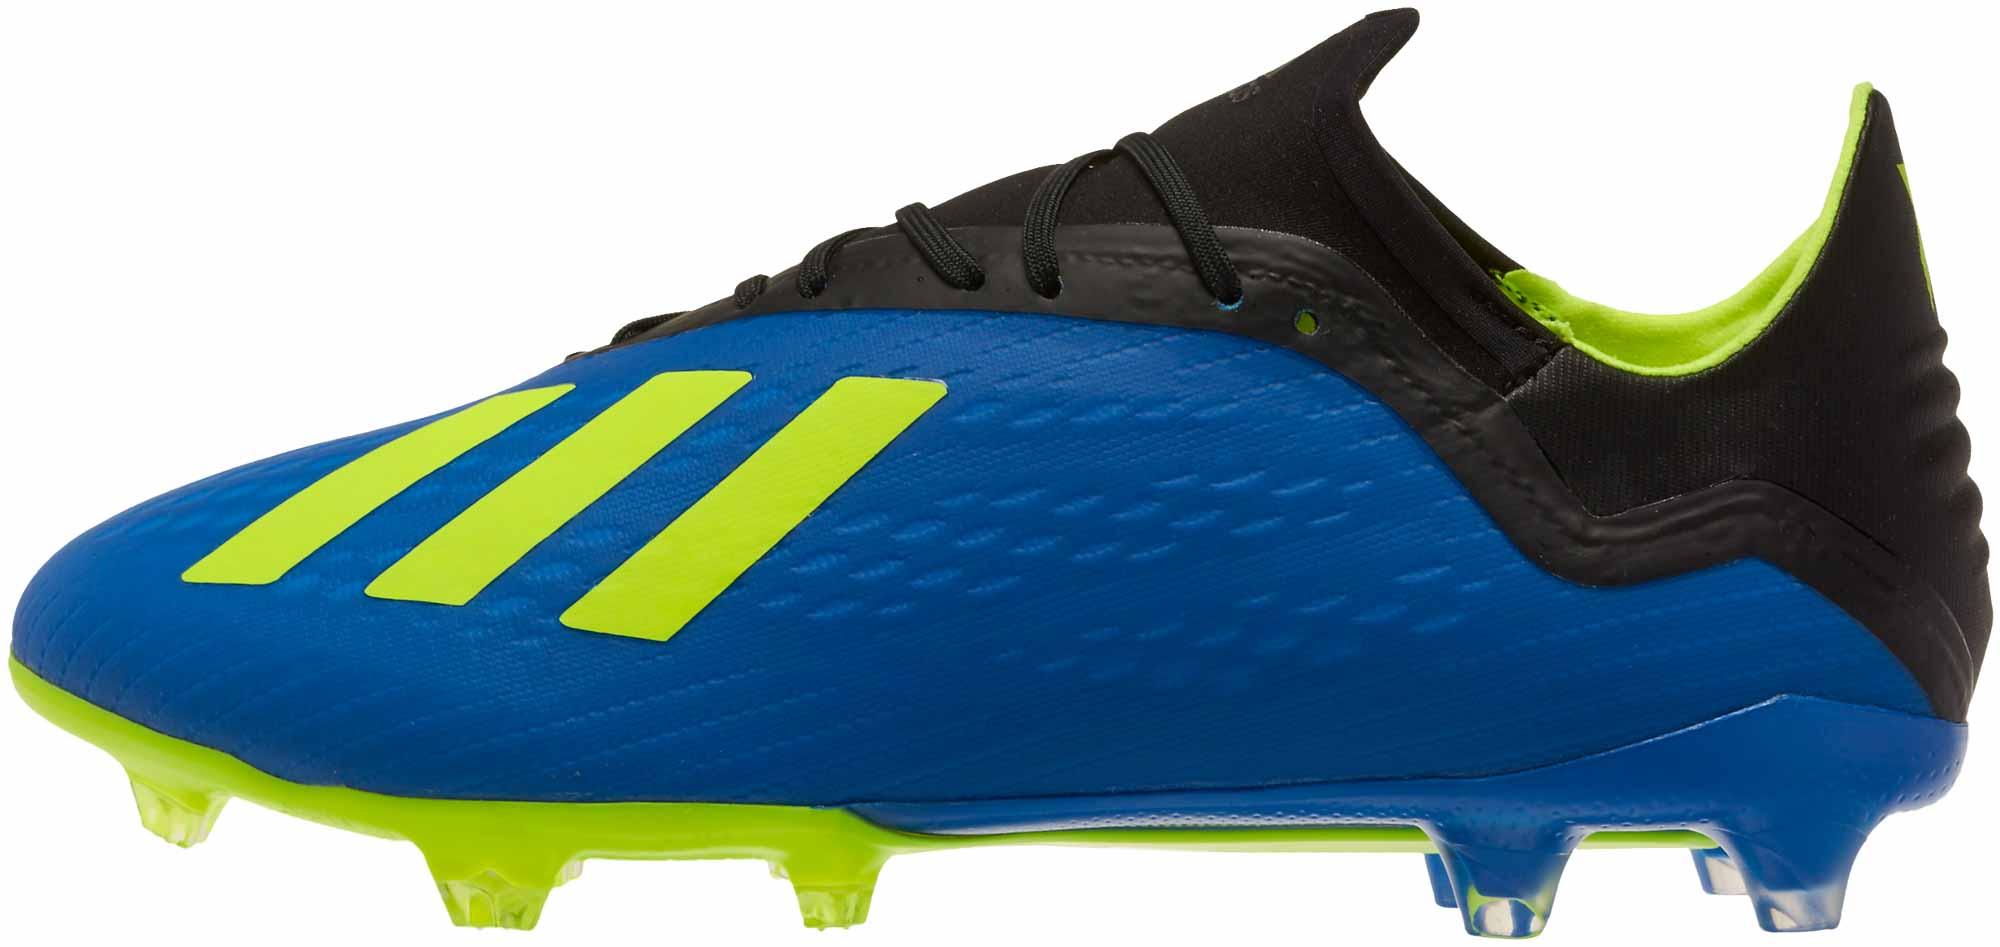 pretty nice 83a65 34345 adidas X 18.2 FG - Football Blue/Solar Yellow/Black - Soccer Master